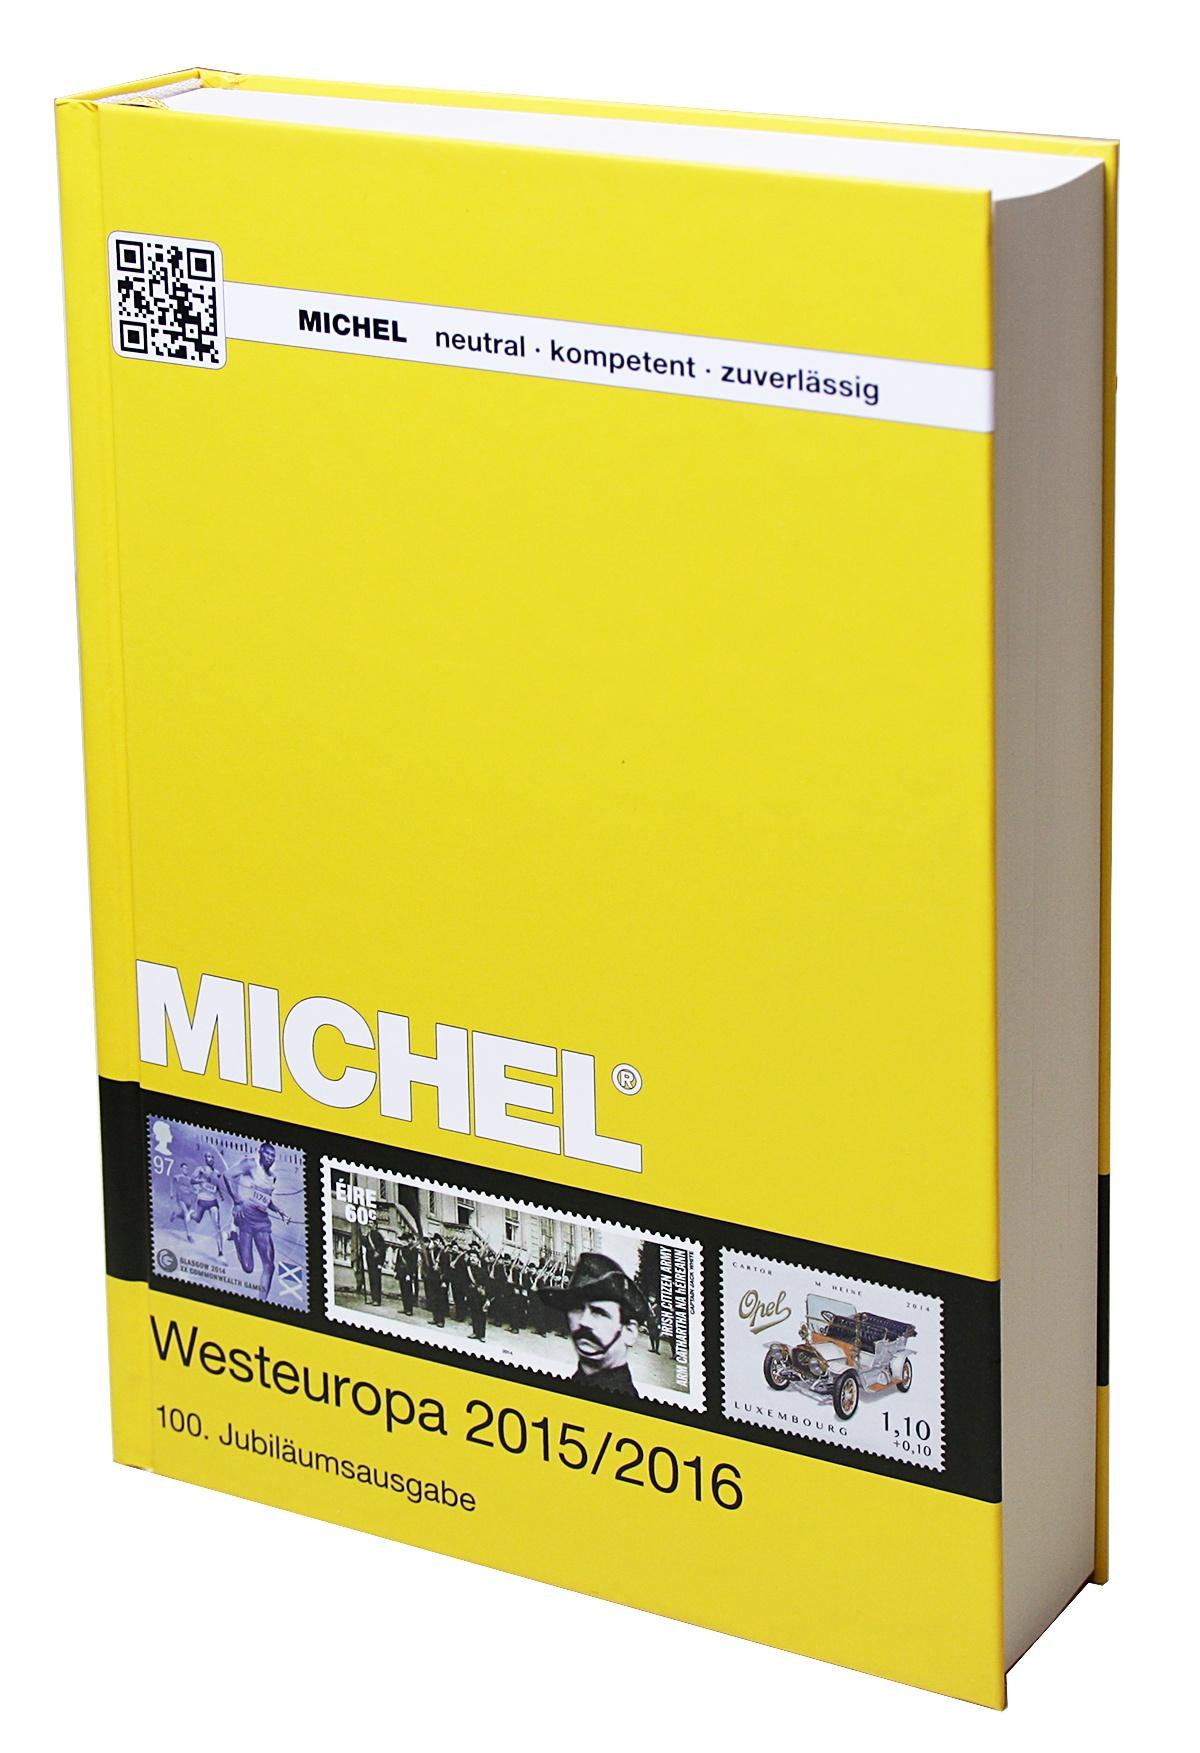 michel evropa 6 westeuropa katalog 2015 2016 eshop. Black Bedroom Furniture Sets. Home Design Ideas